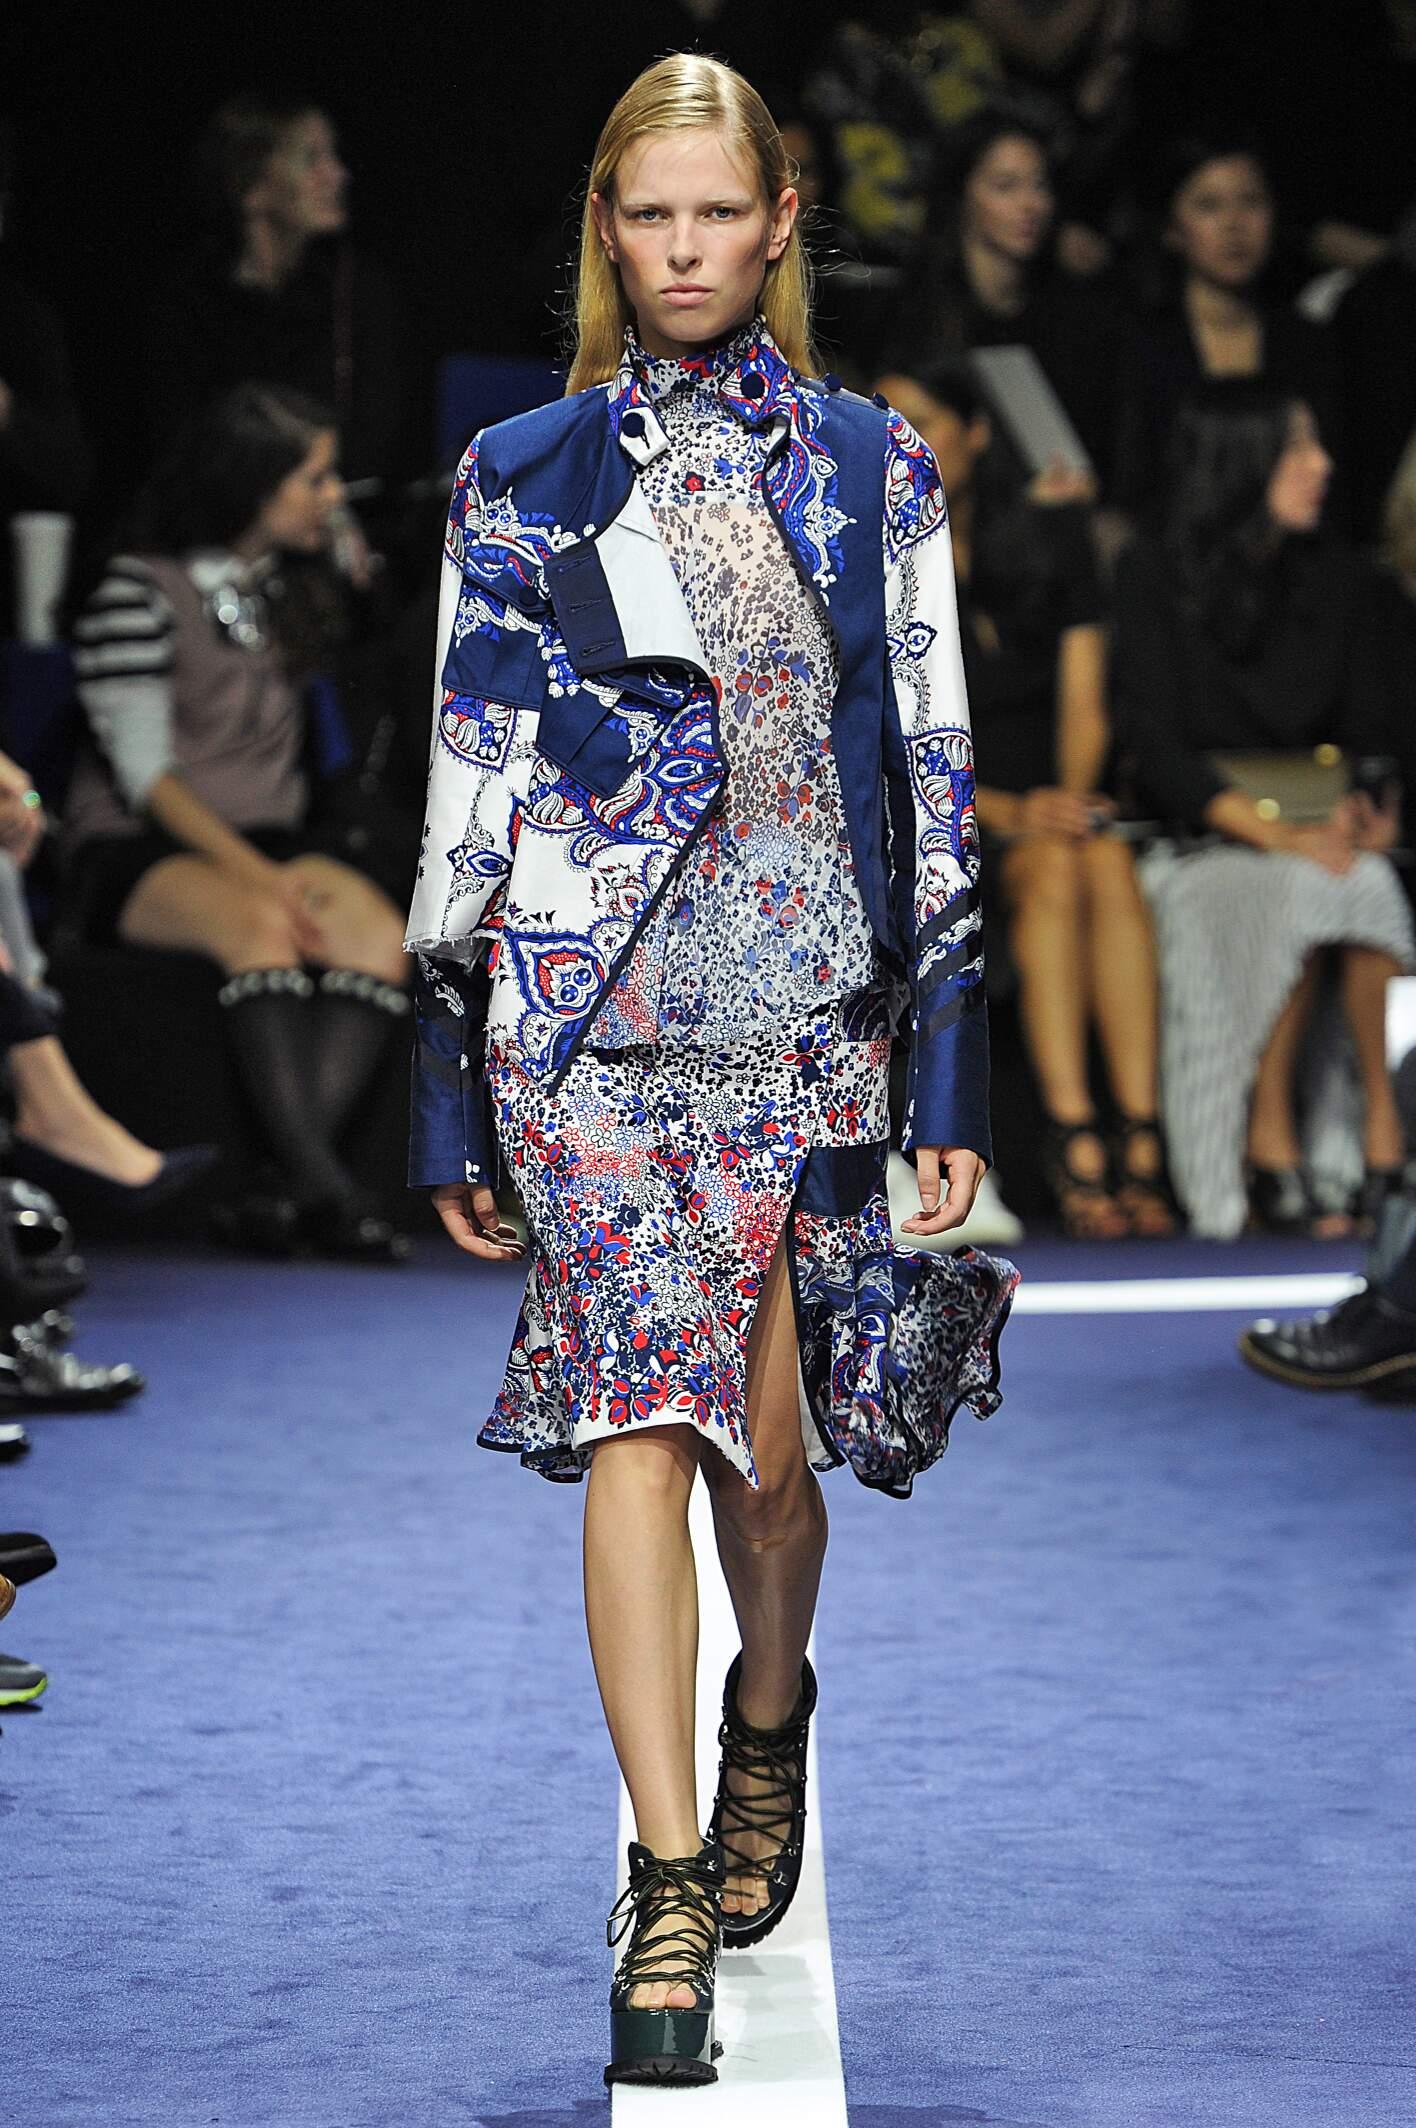 Spring Summer 2015 Fashion Model Sacai